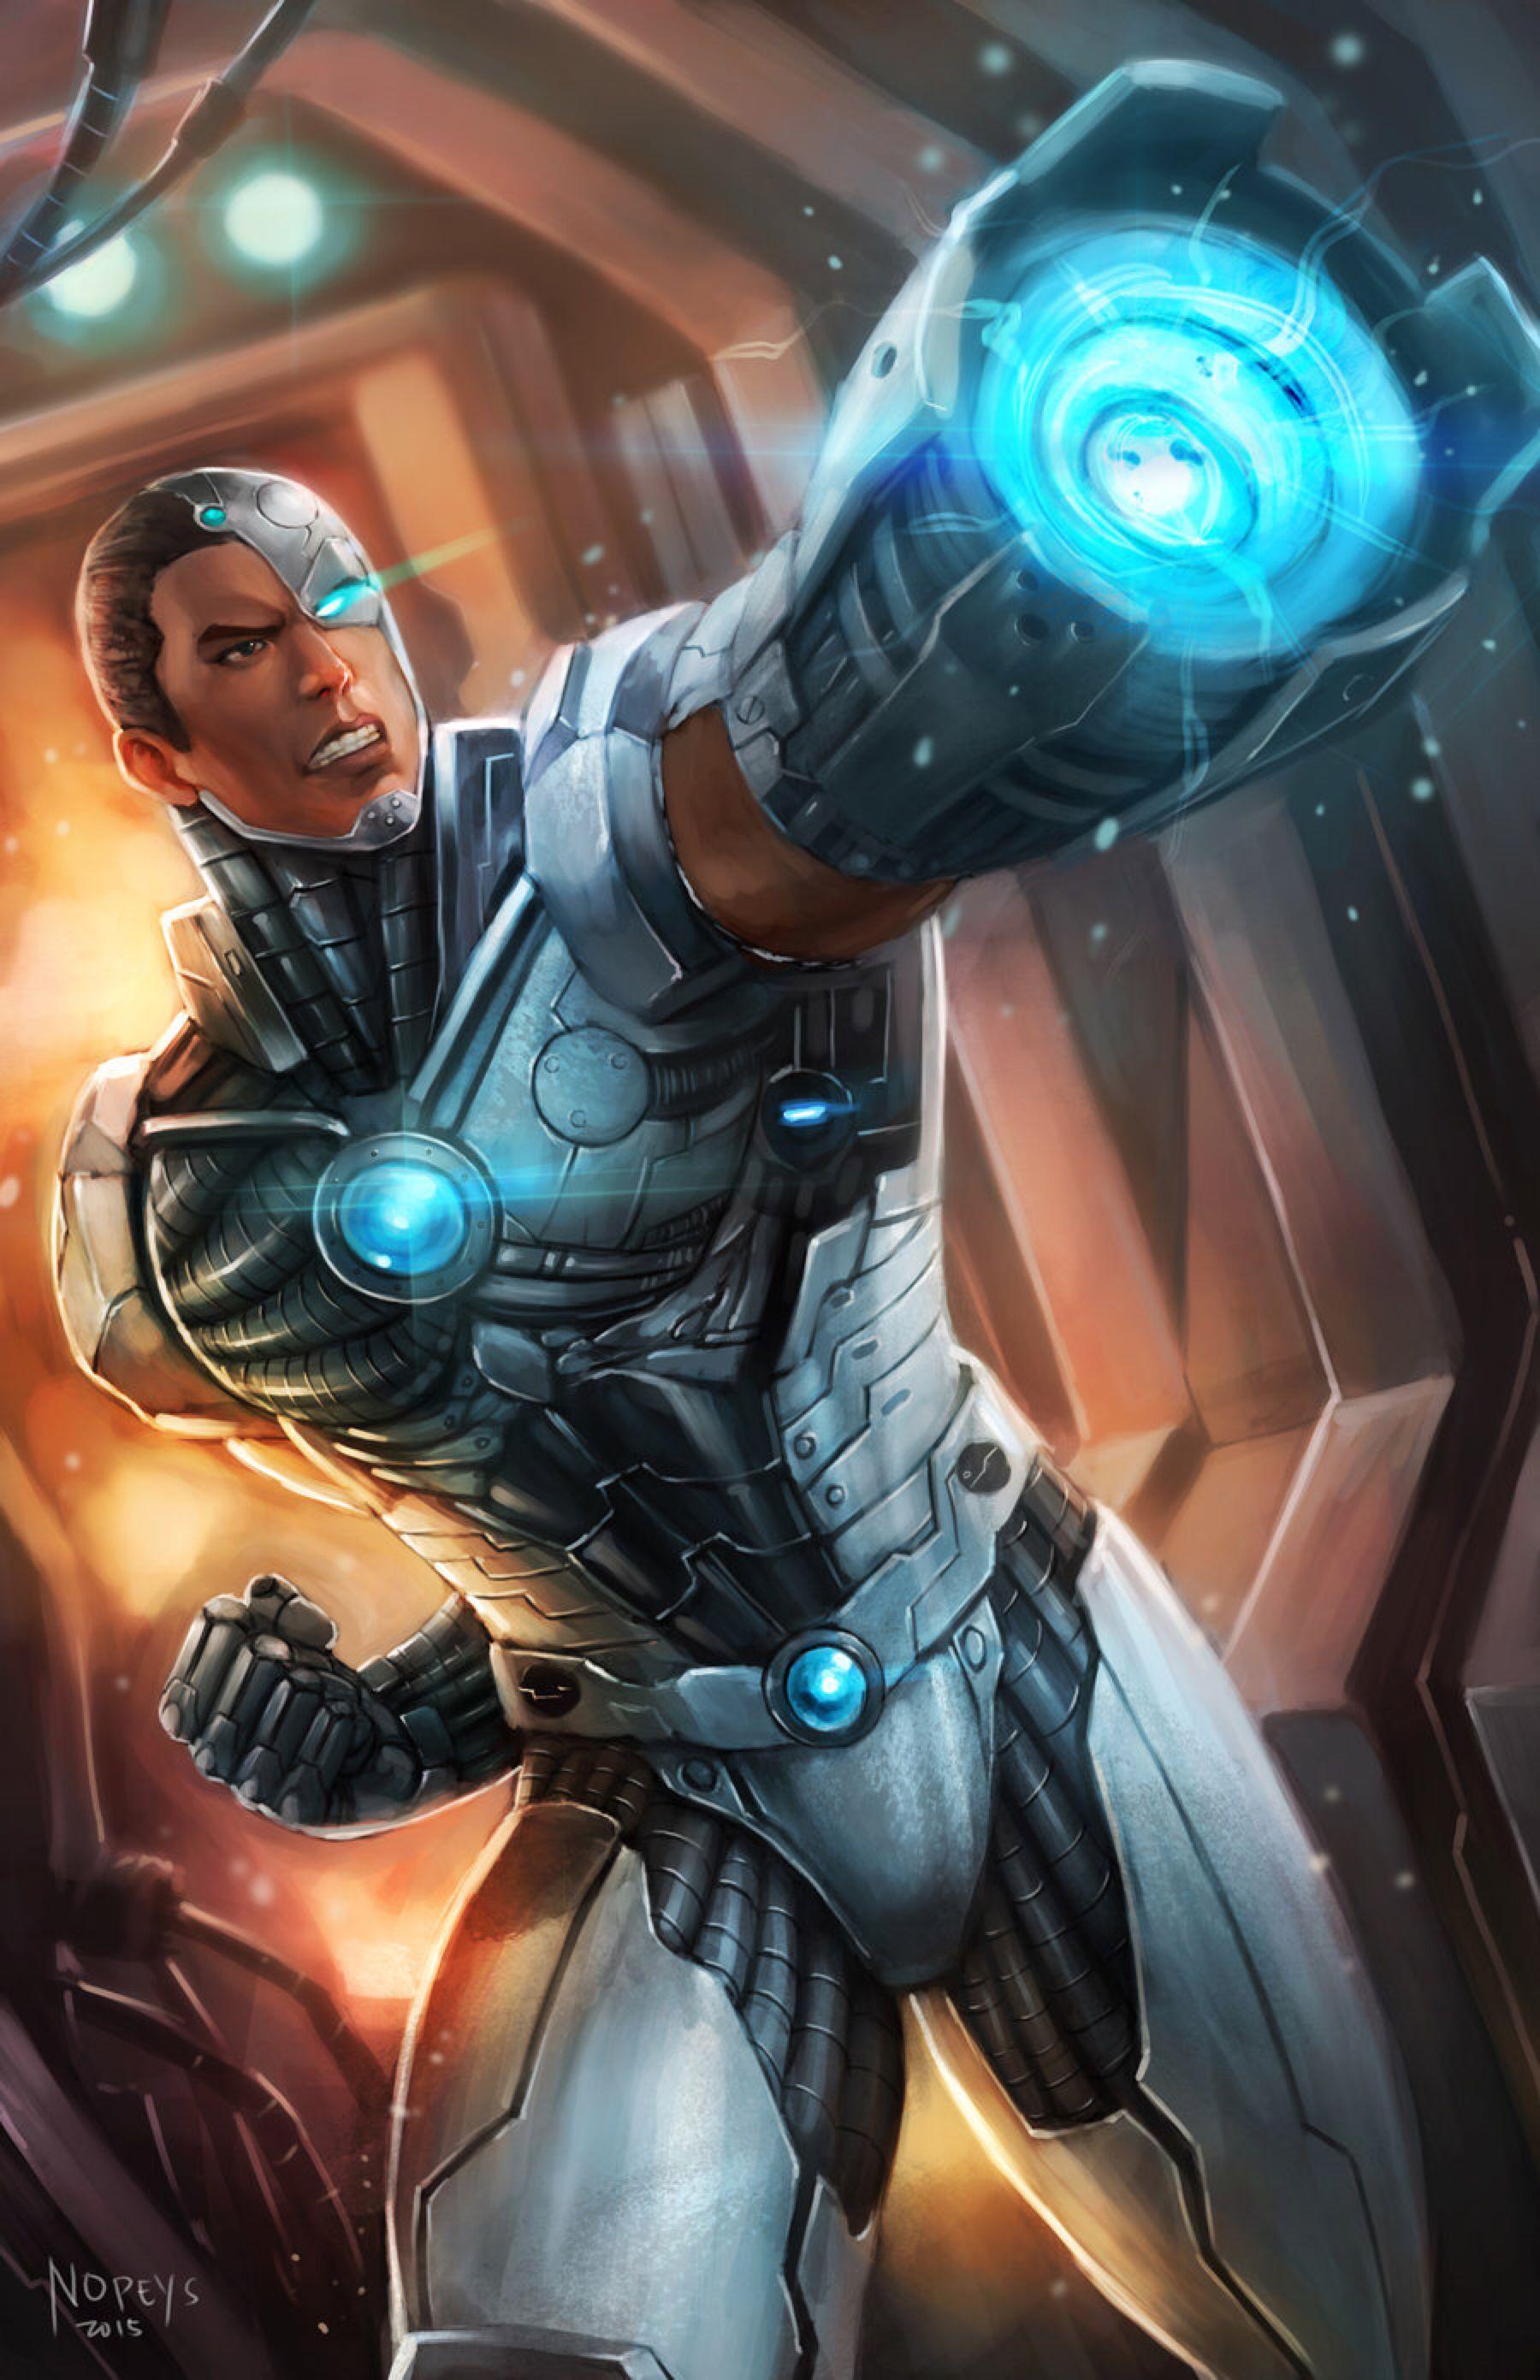 Cyborg By Nopeys On Deviantart Dc Pinterest Comics Iron Man Circuit Superhros Marvel Logostore Comic Character Heroes